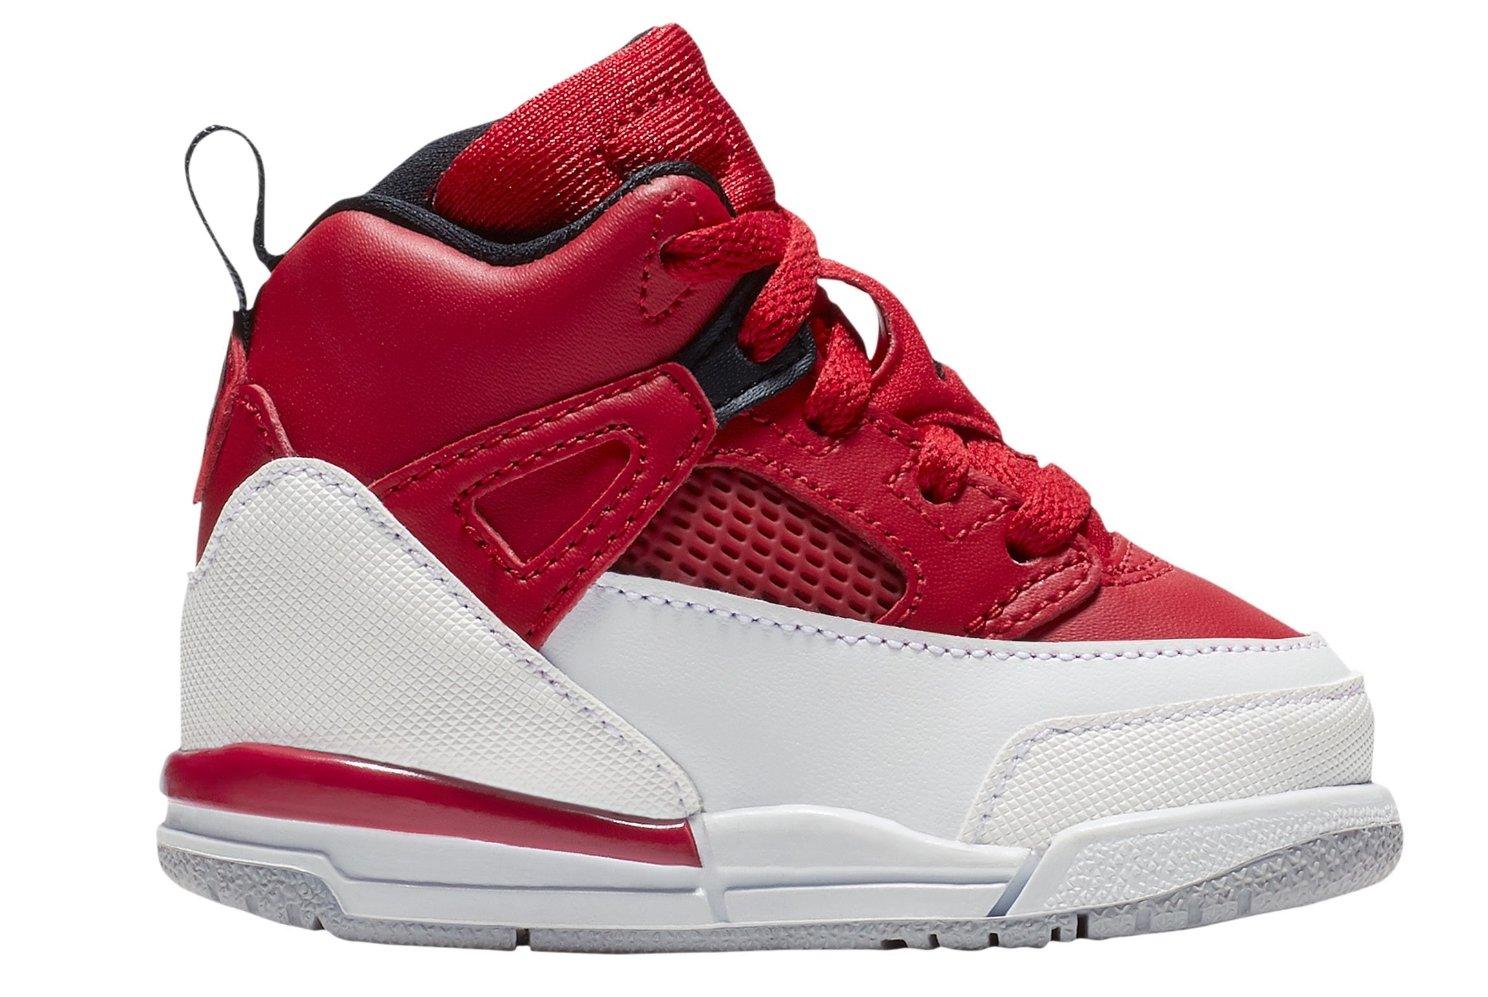 super popular 6b81c d2dcc Galleon - Jordan Spizike BT Toddler Basketball Shoes Gym Red Black White Wolf  Grey 317701-603 (9 M US)